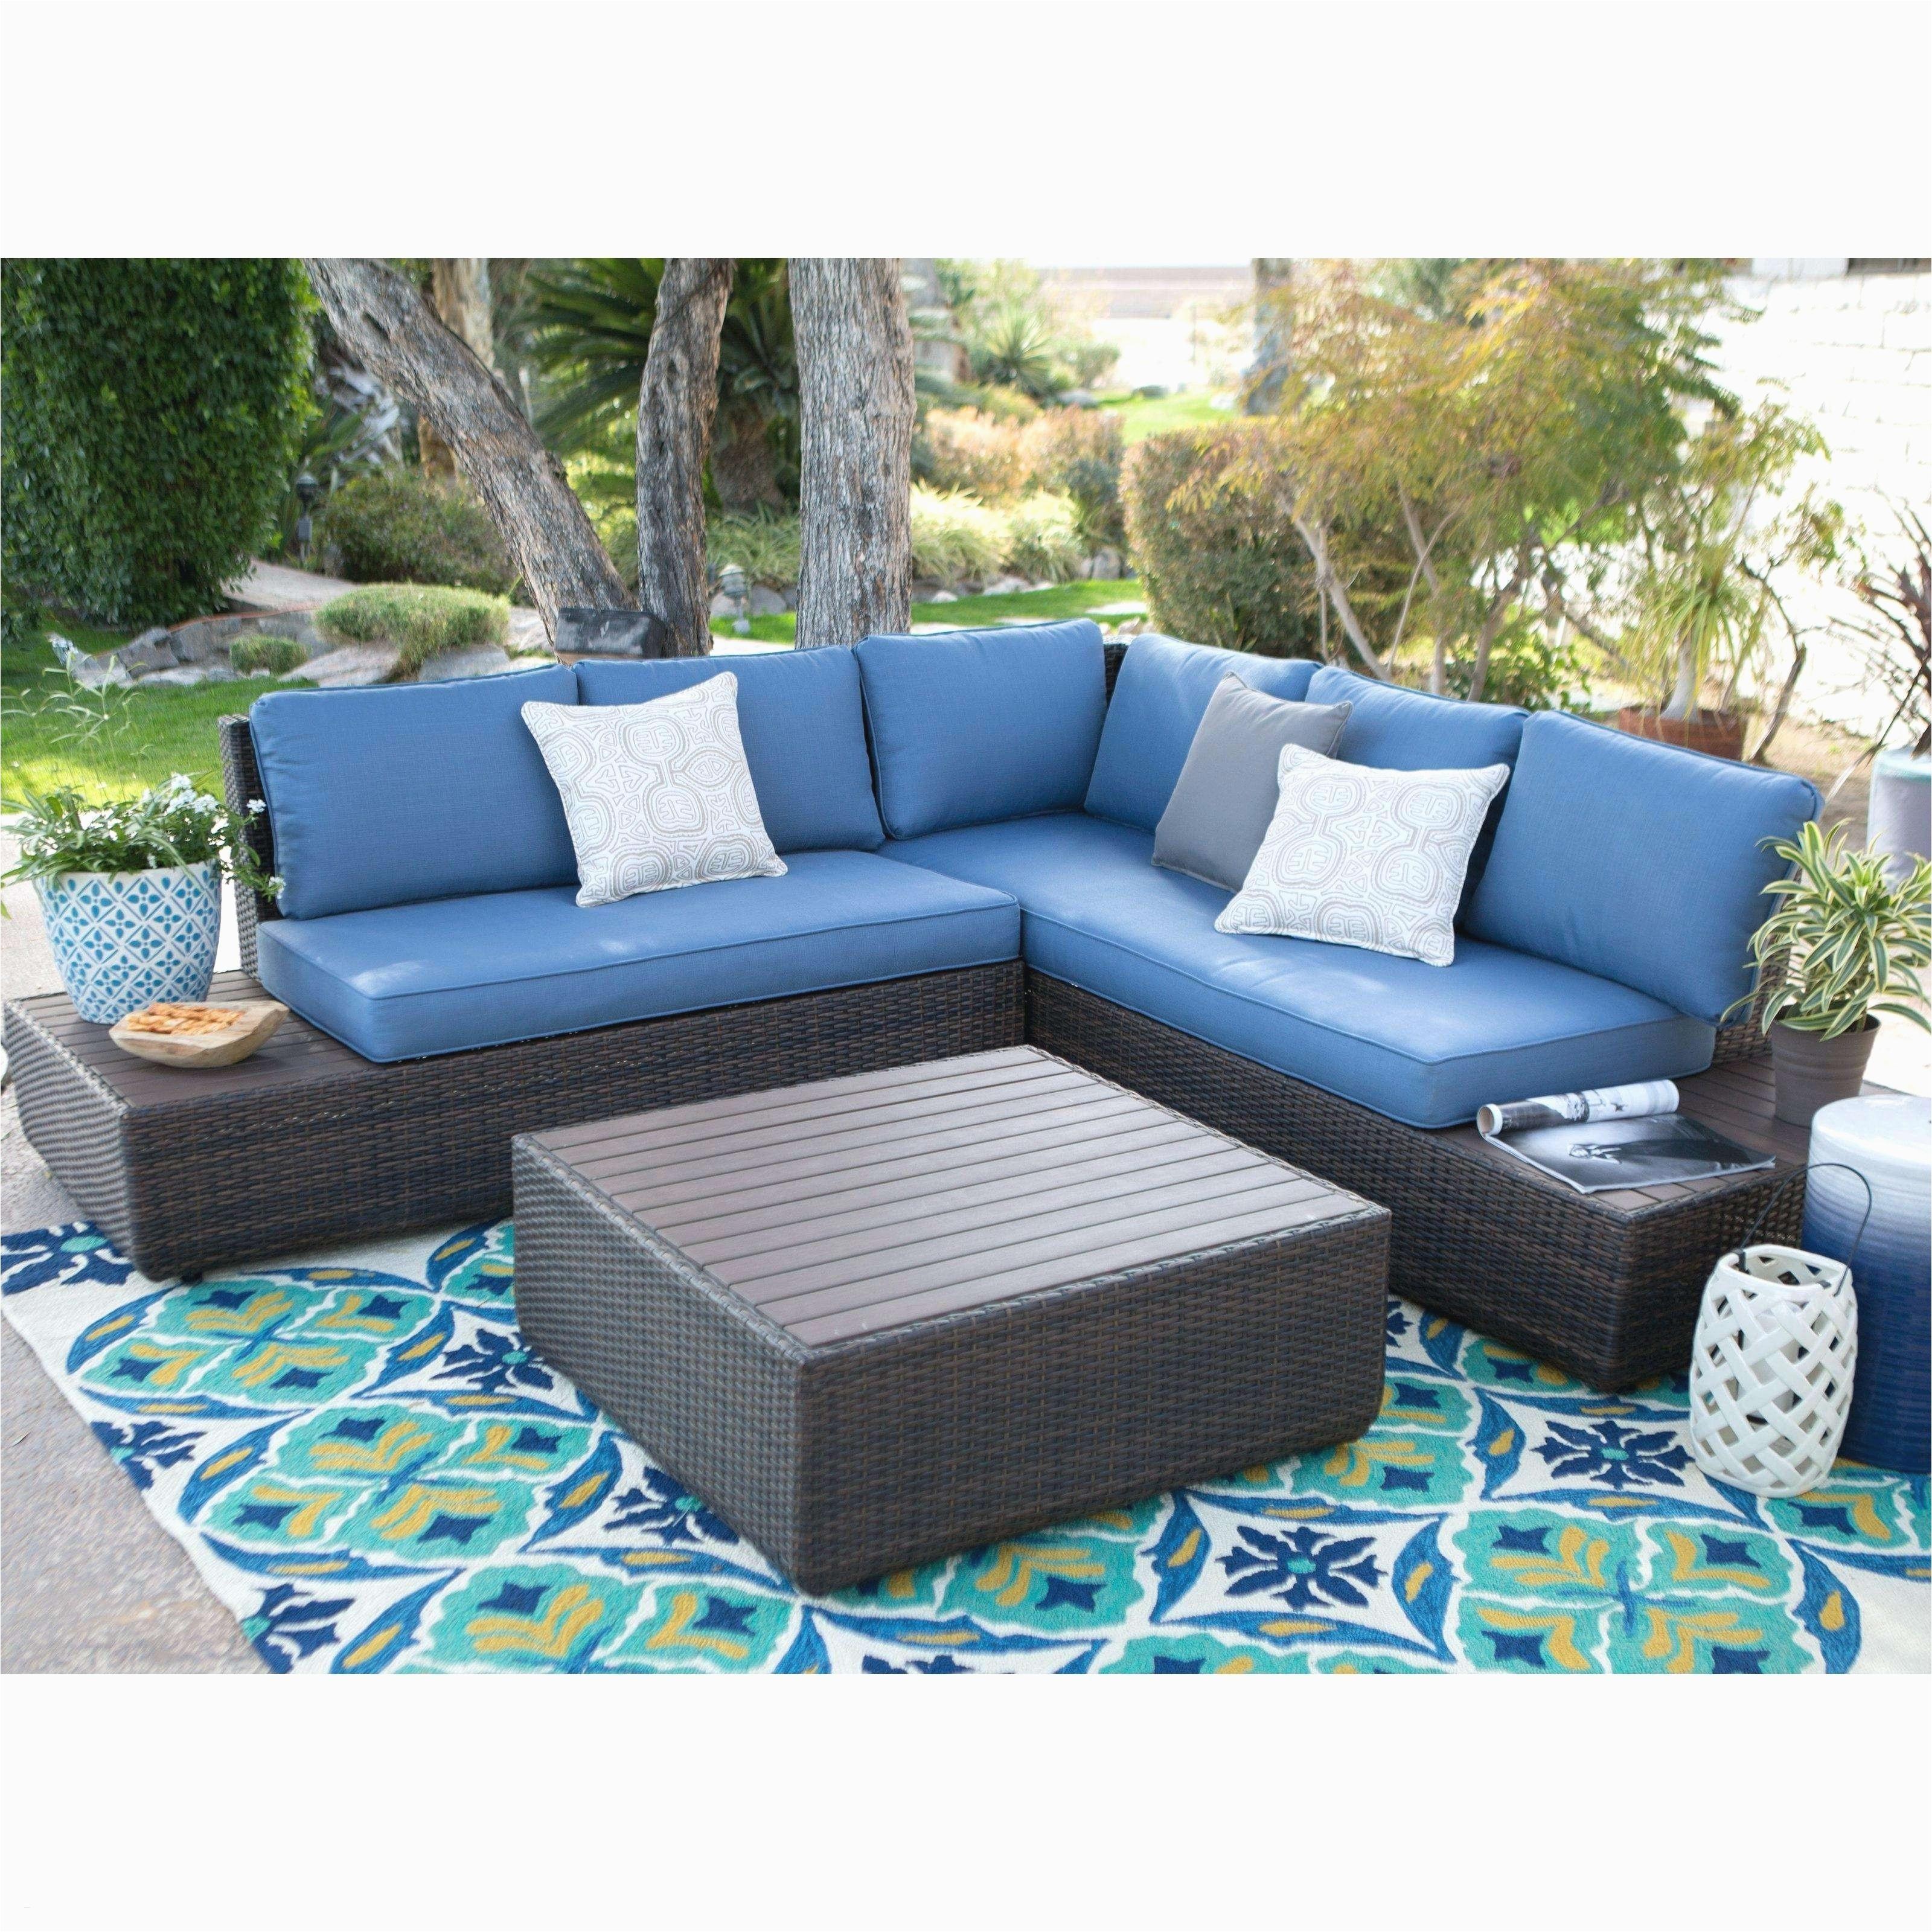 Unique 22 Affordable Outdoor Furniture Home Furniture Ideas Discount  Furniture Birmingham Al ...